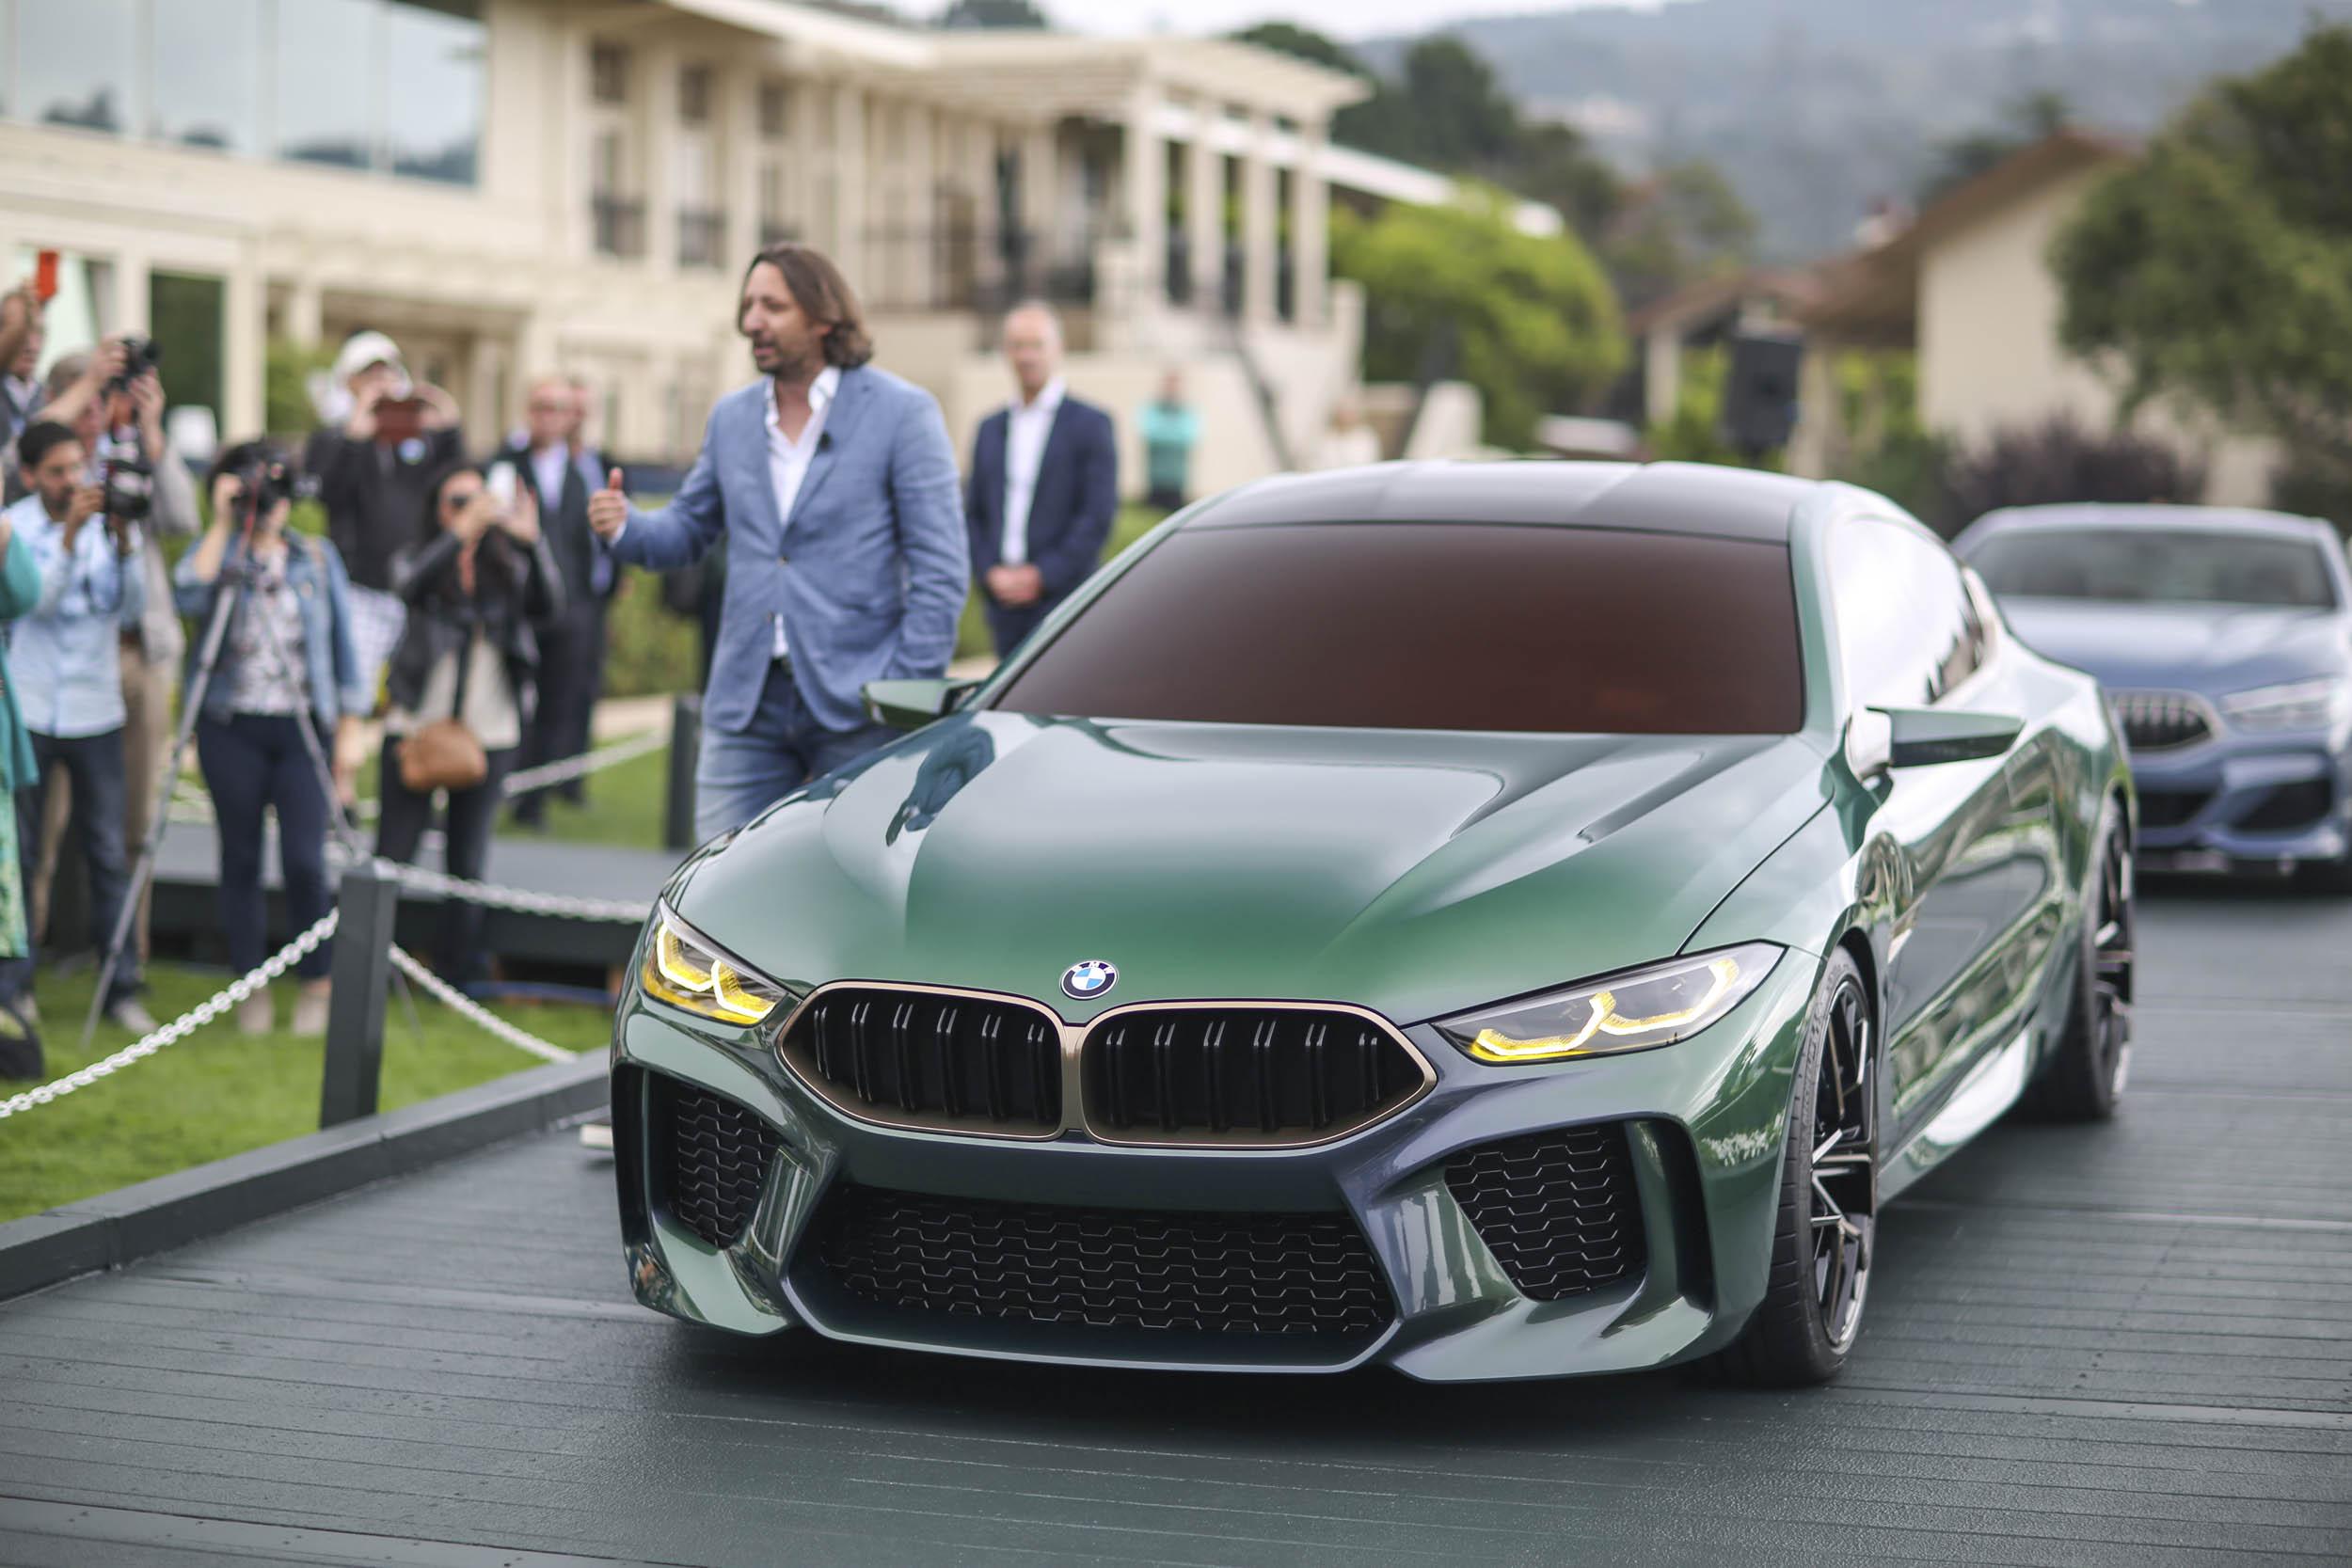 BMW M8 Gran Coupe Pebble Beach unveil